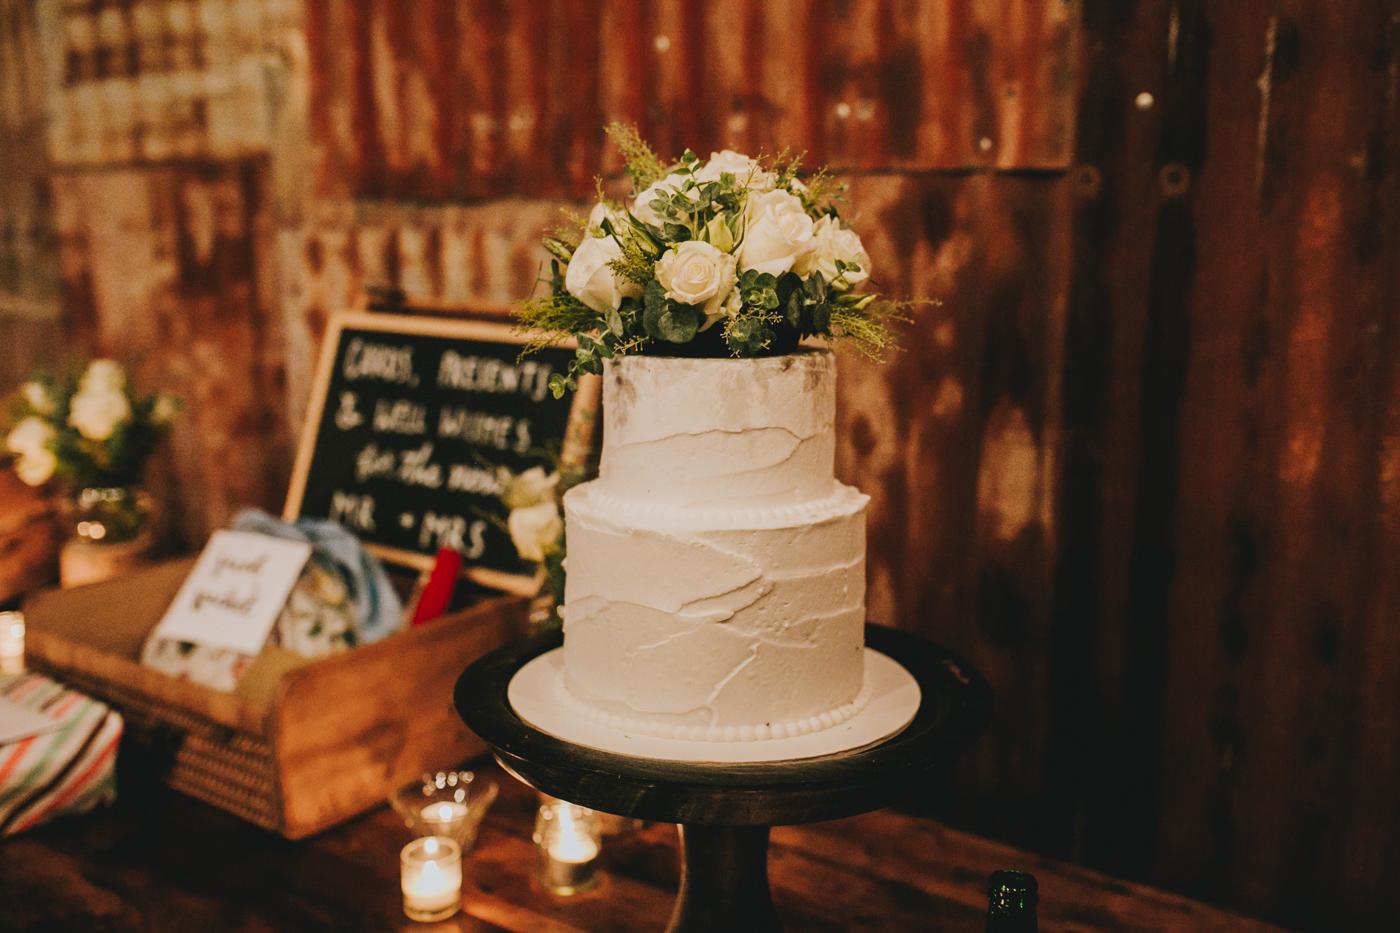 Rachel & Jacob - Willow Farm Berry - South Coast Wedding - Samantha Heather Photography-174.jpg